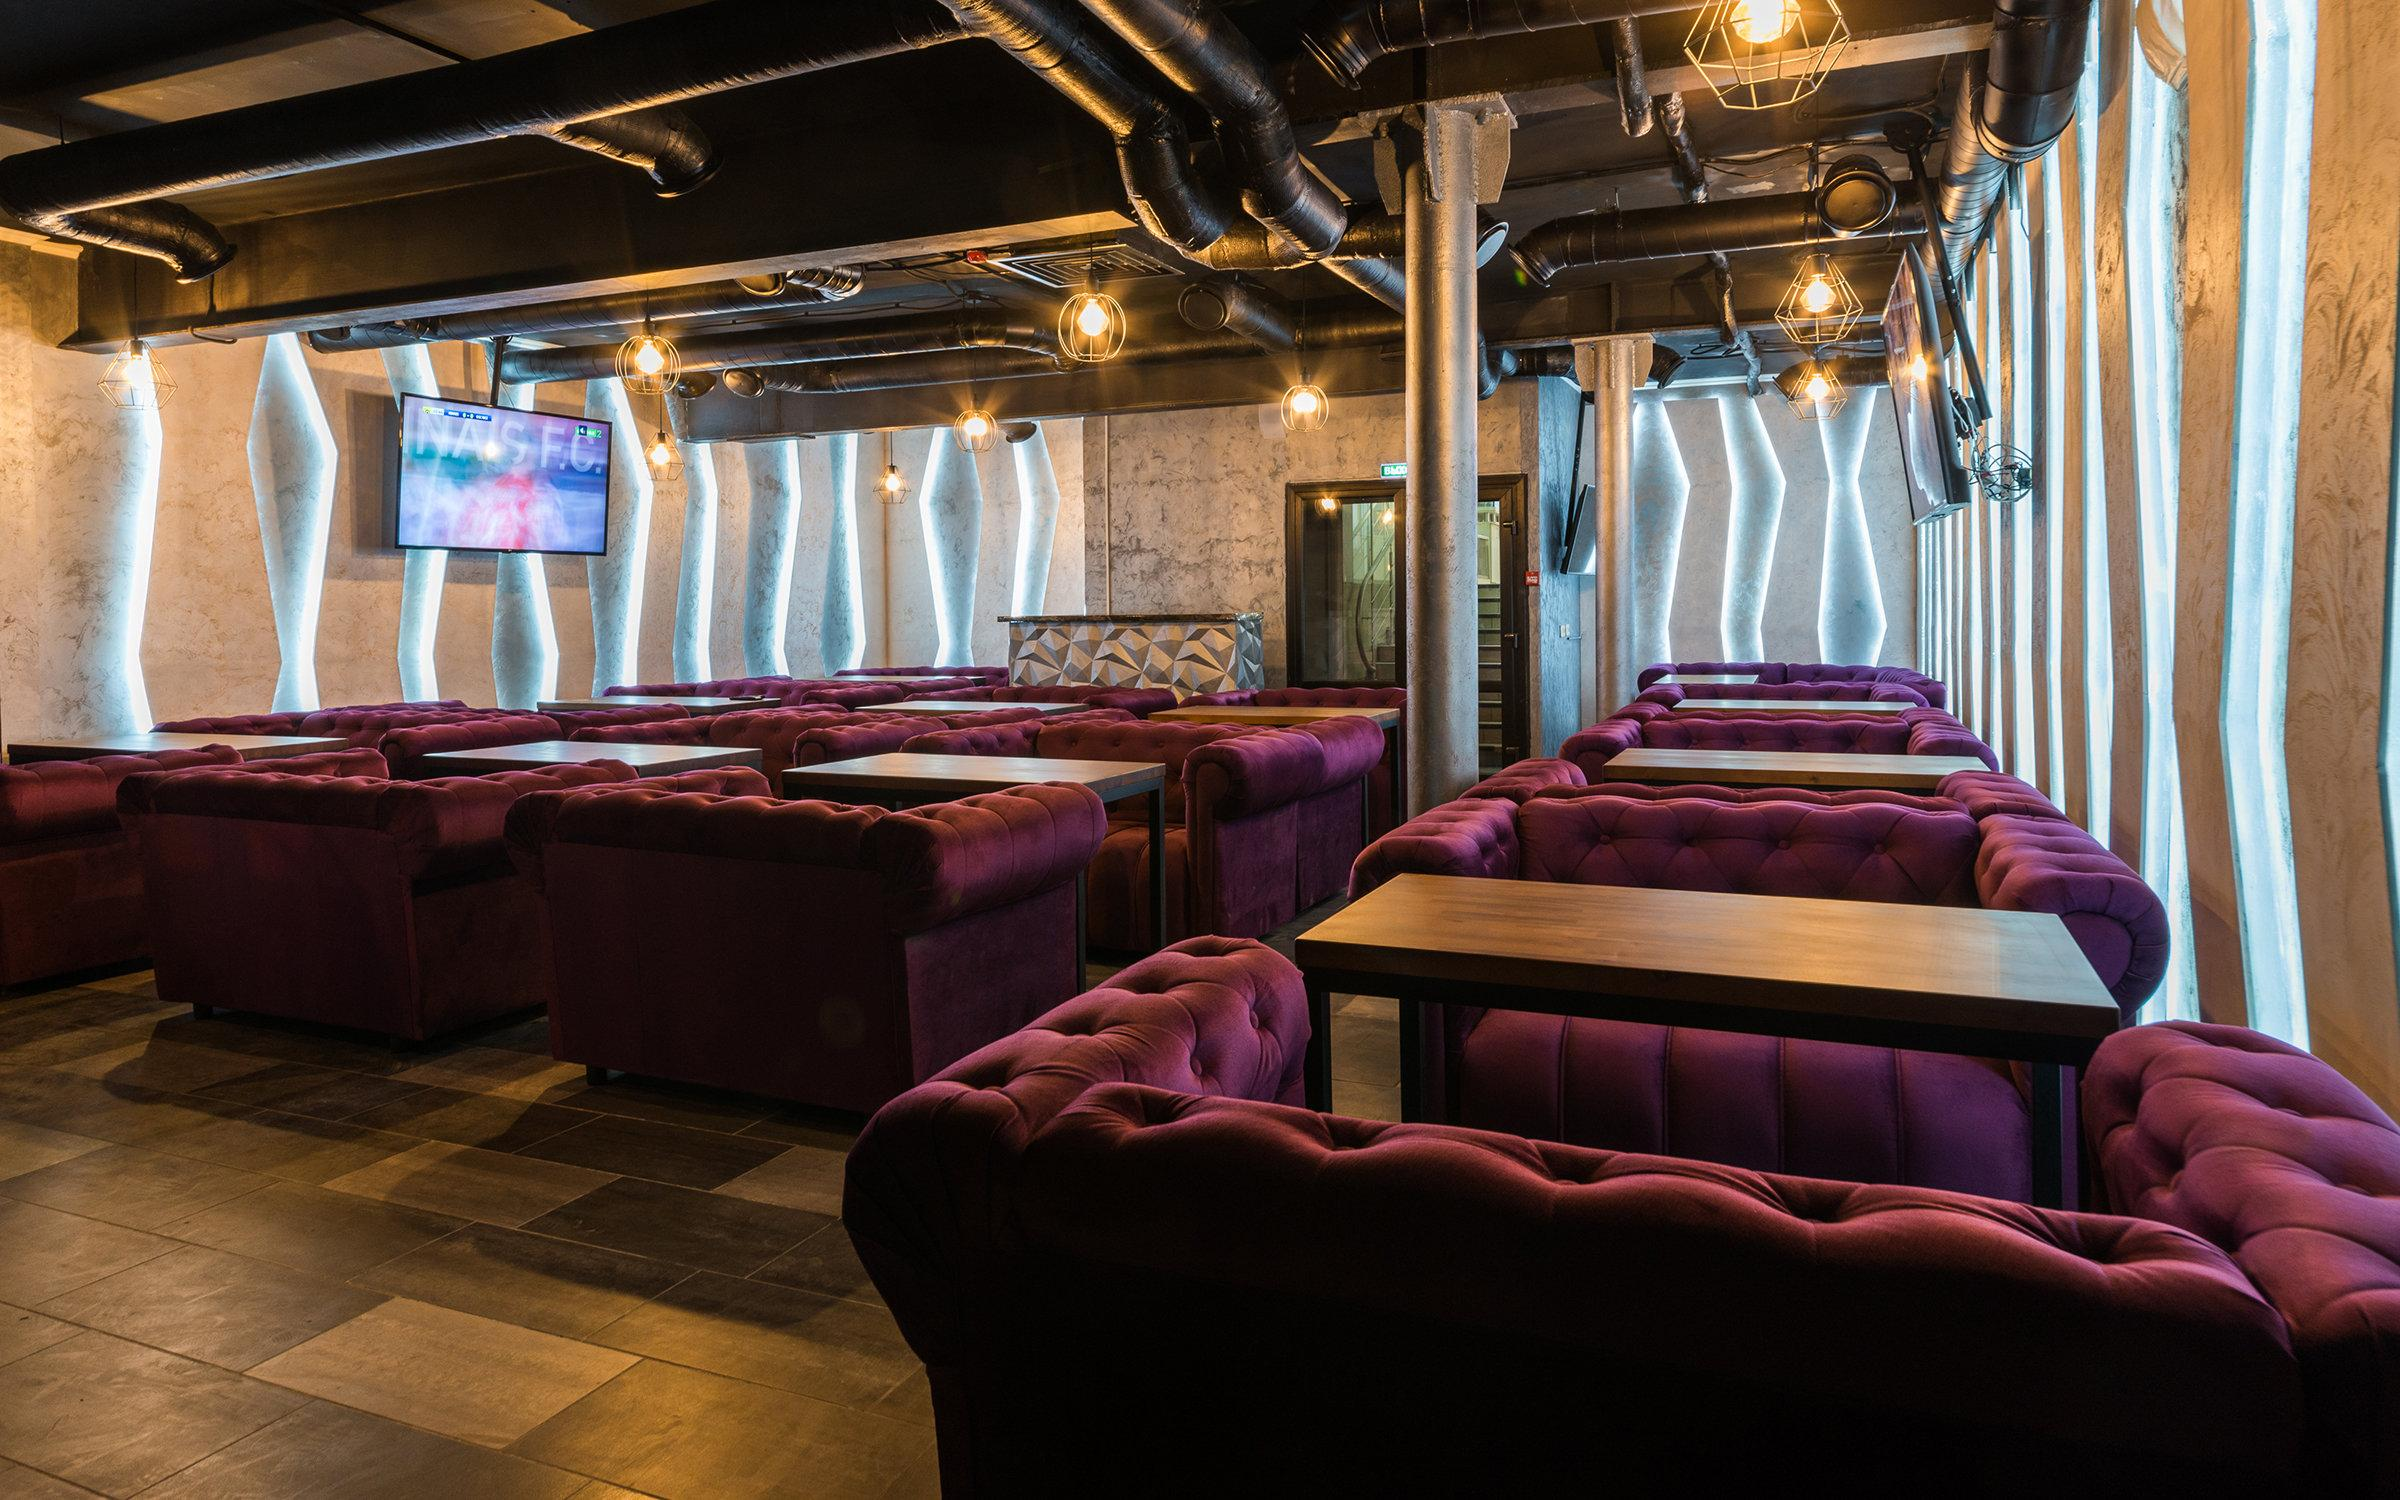 фотография Центра паровых коктейлей Мята Lounge на улице Академика Анохина